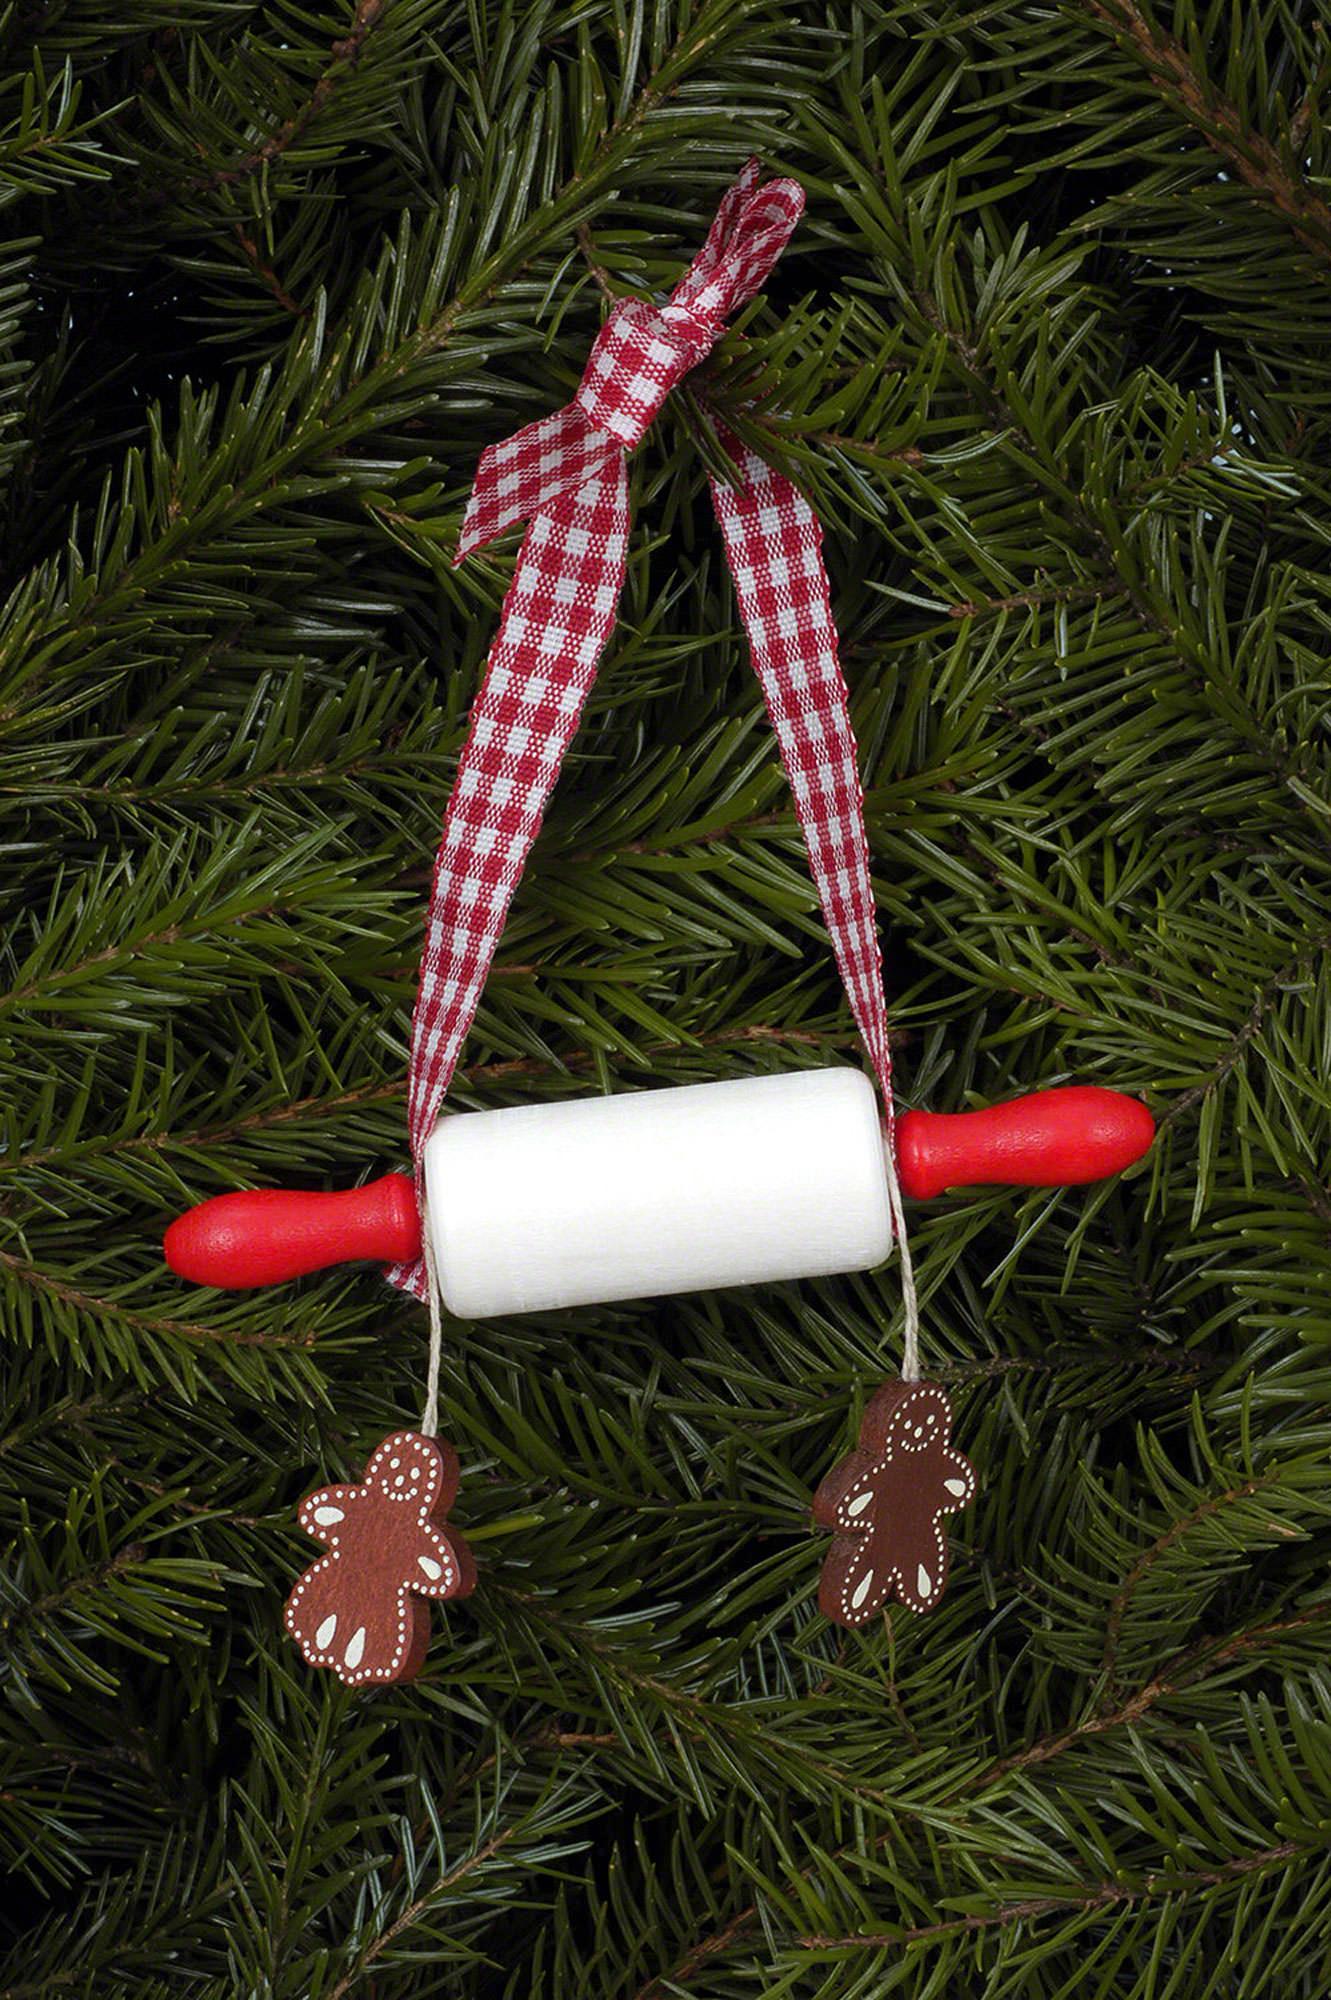 Rolling pin ornament - Tree Ornament Rolling Pin 10 0 X 2 1 Cm 4 X 1 Inch